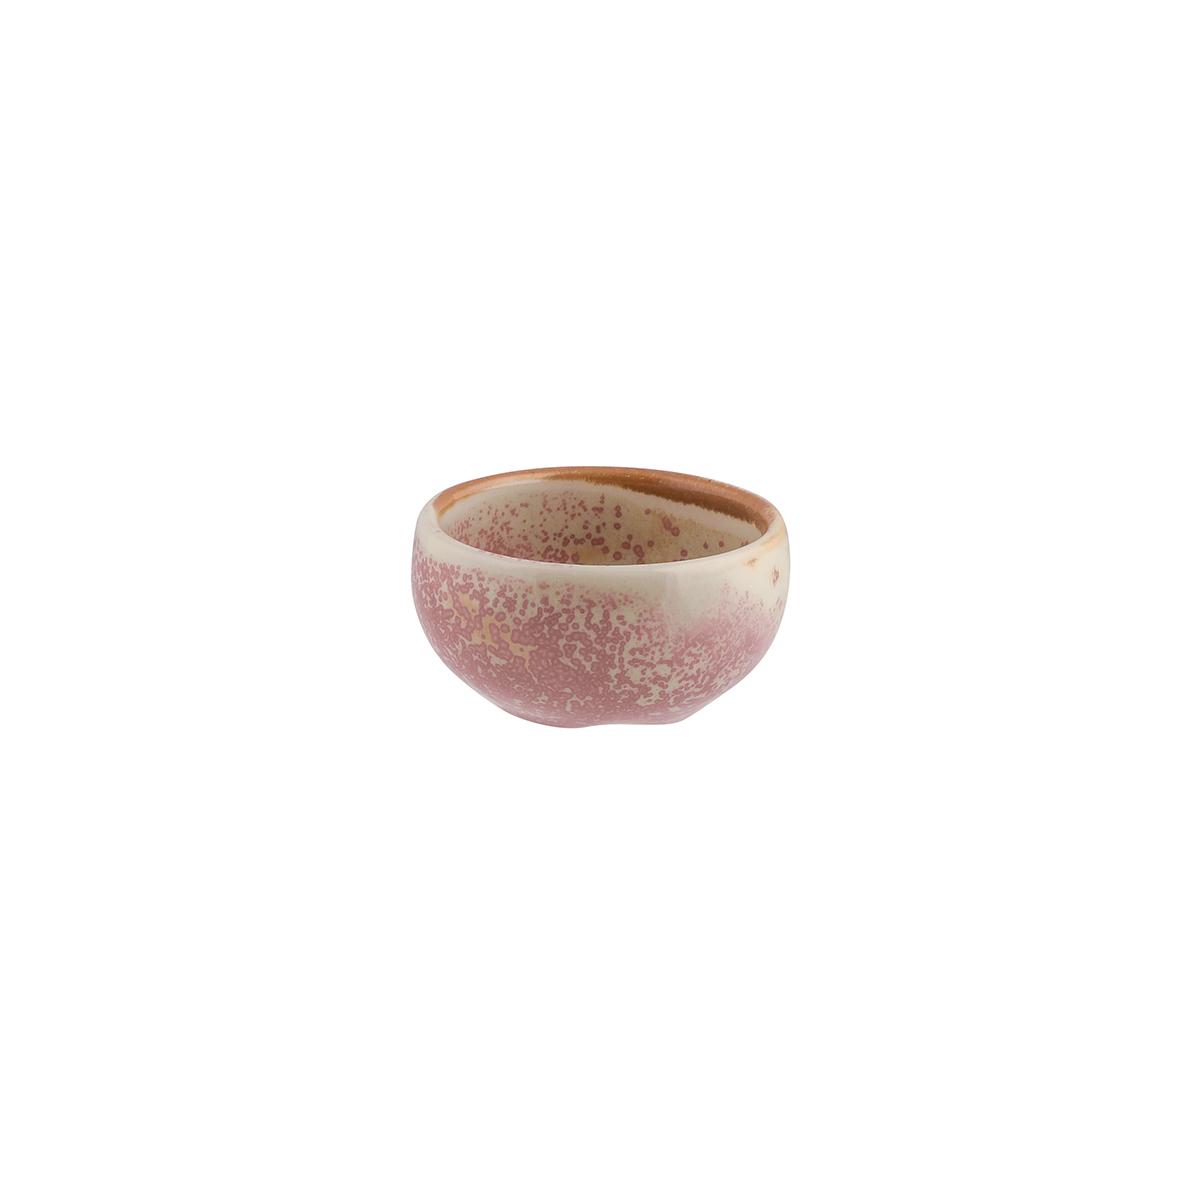 Moda Porcelain Icon Ramekin 75ml 555/926107